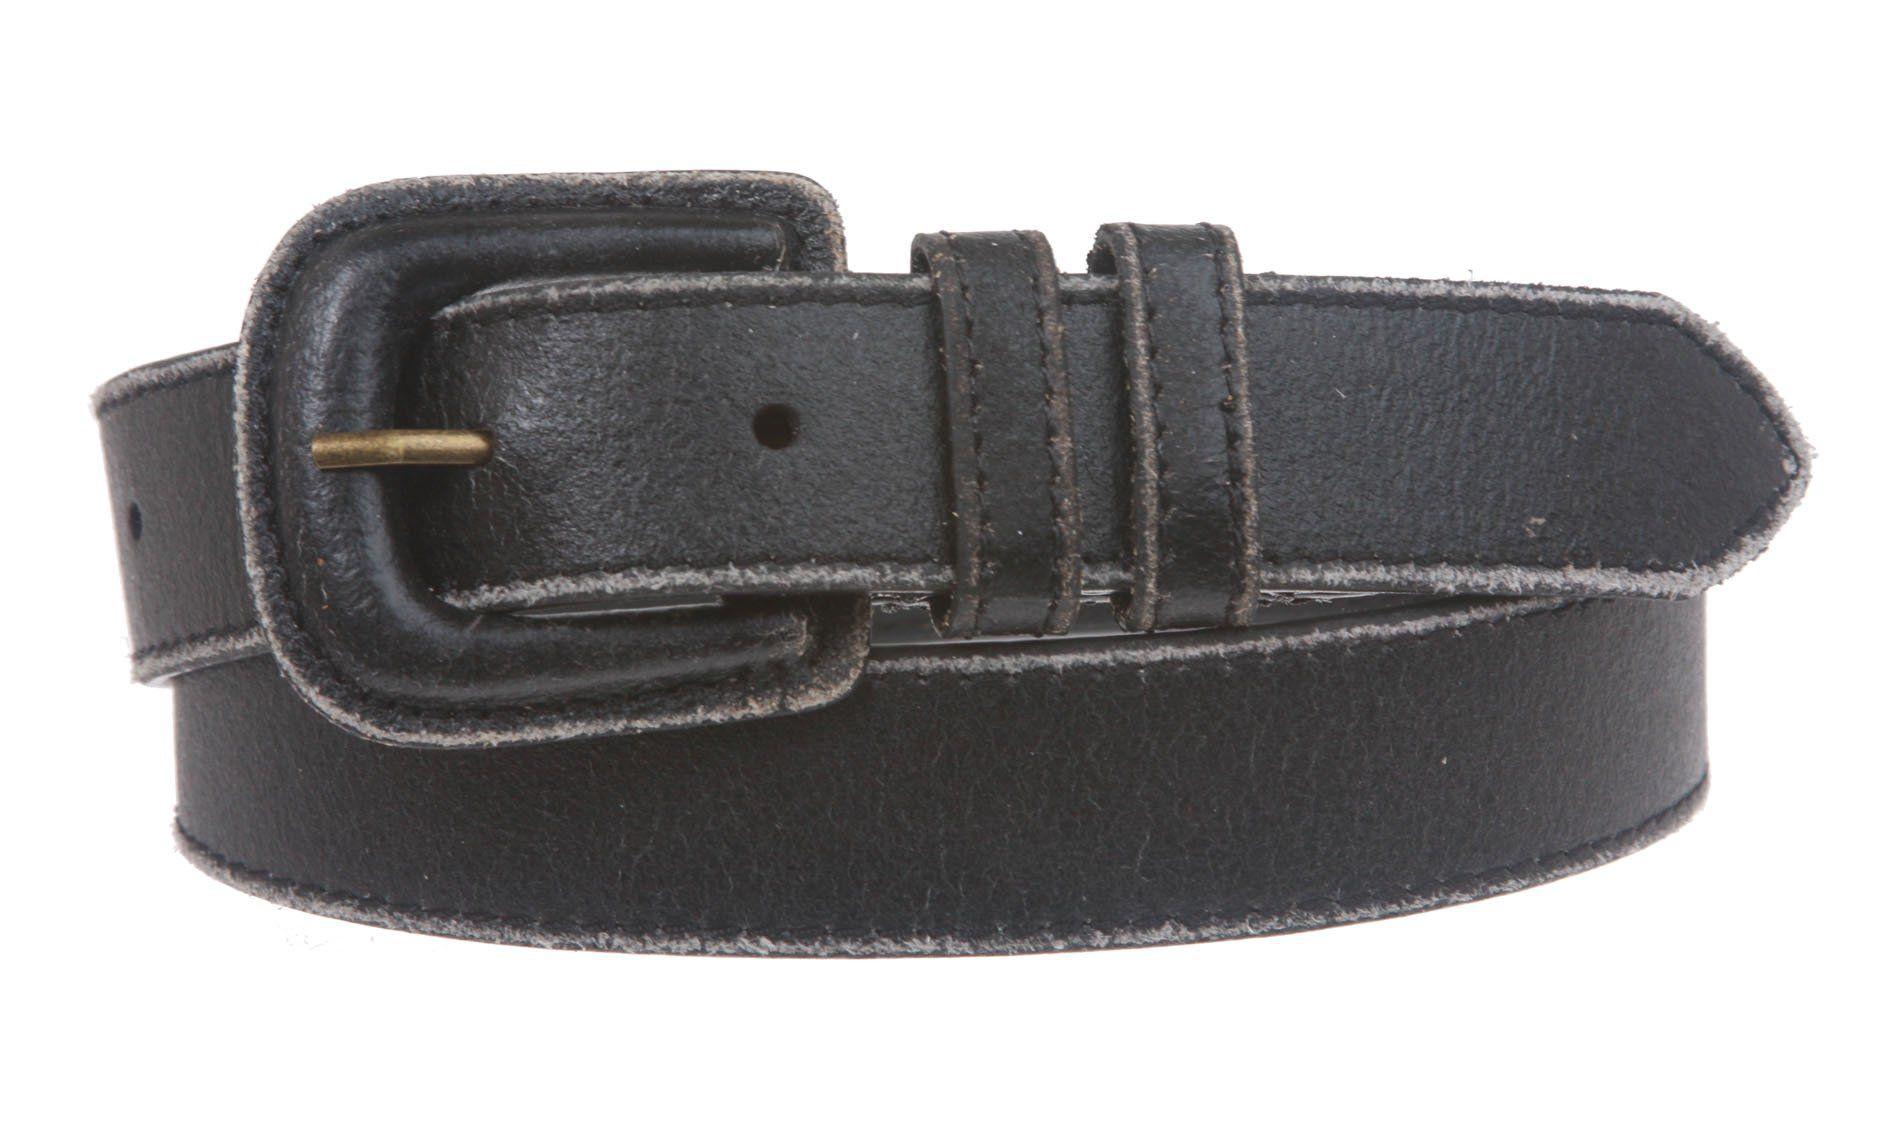 "1"" Vintage Retro Stitching-Edged Distressed Leather Belt"